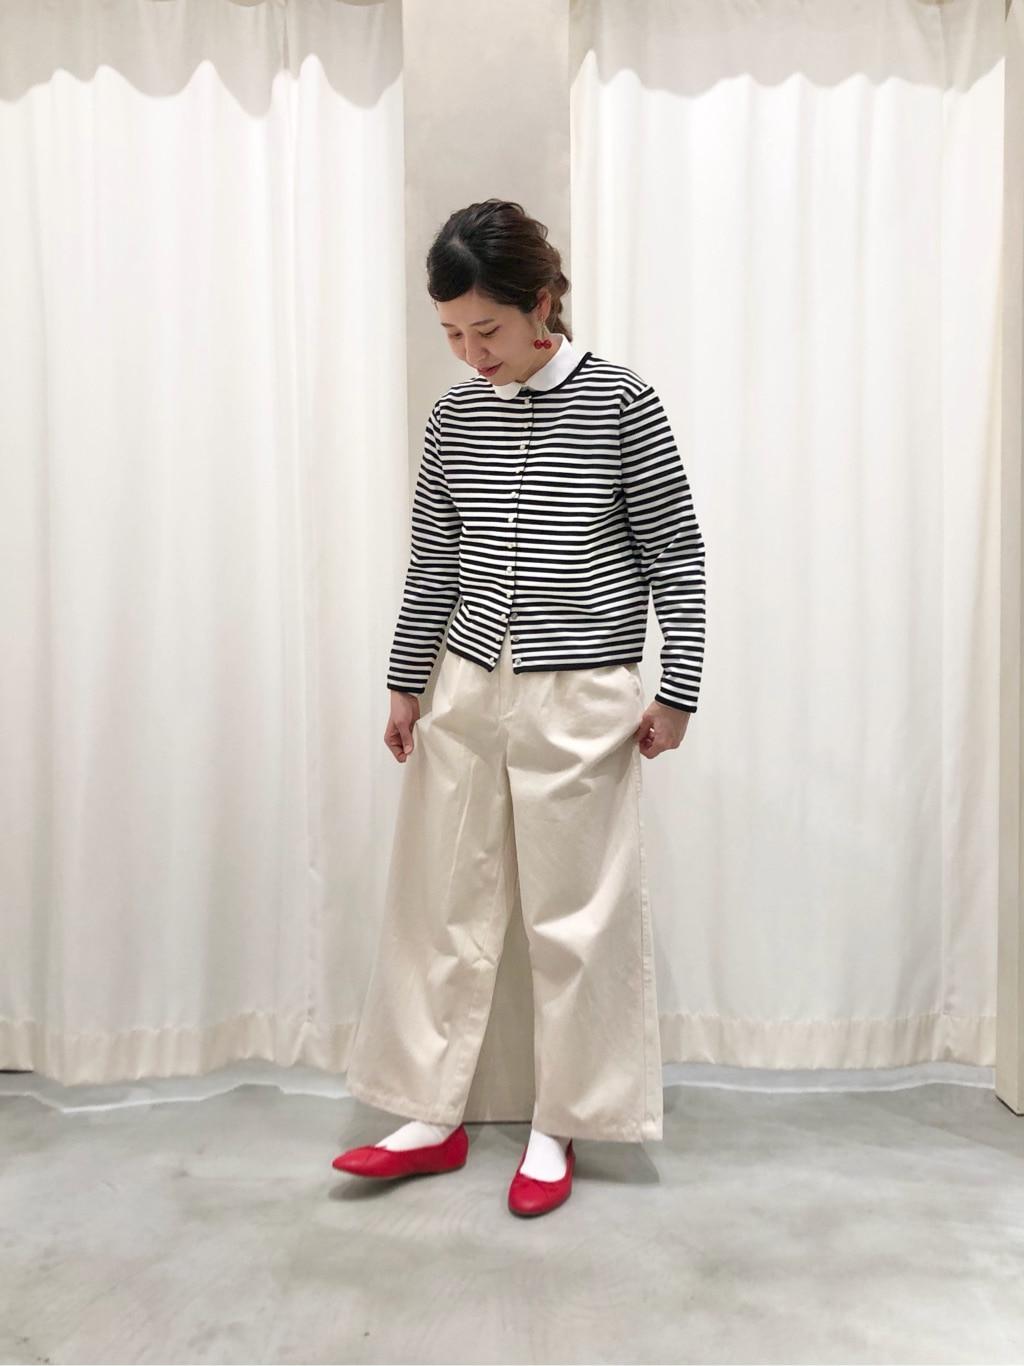 CHILD WOMAN , PAR ICI 東京スカイツリータウン・ソラマチ 2021.02.04